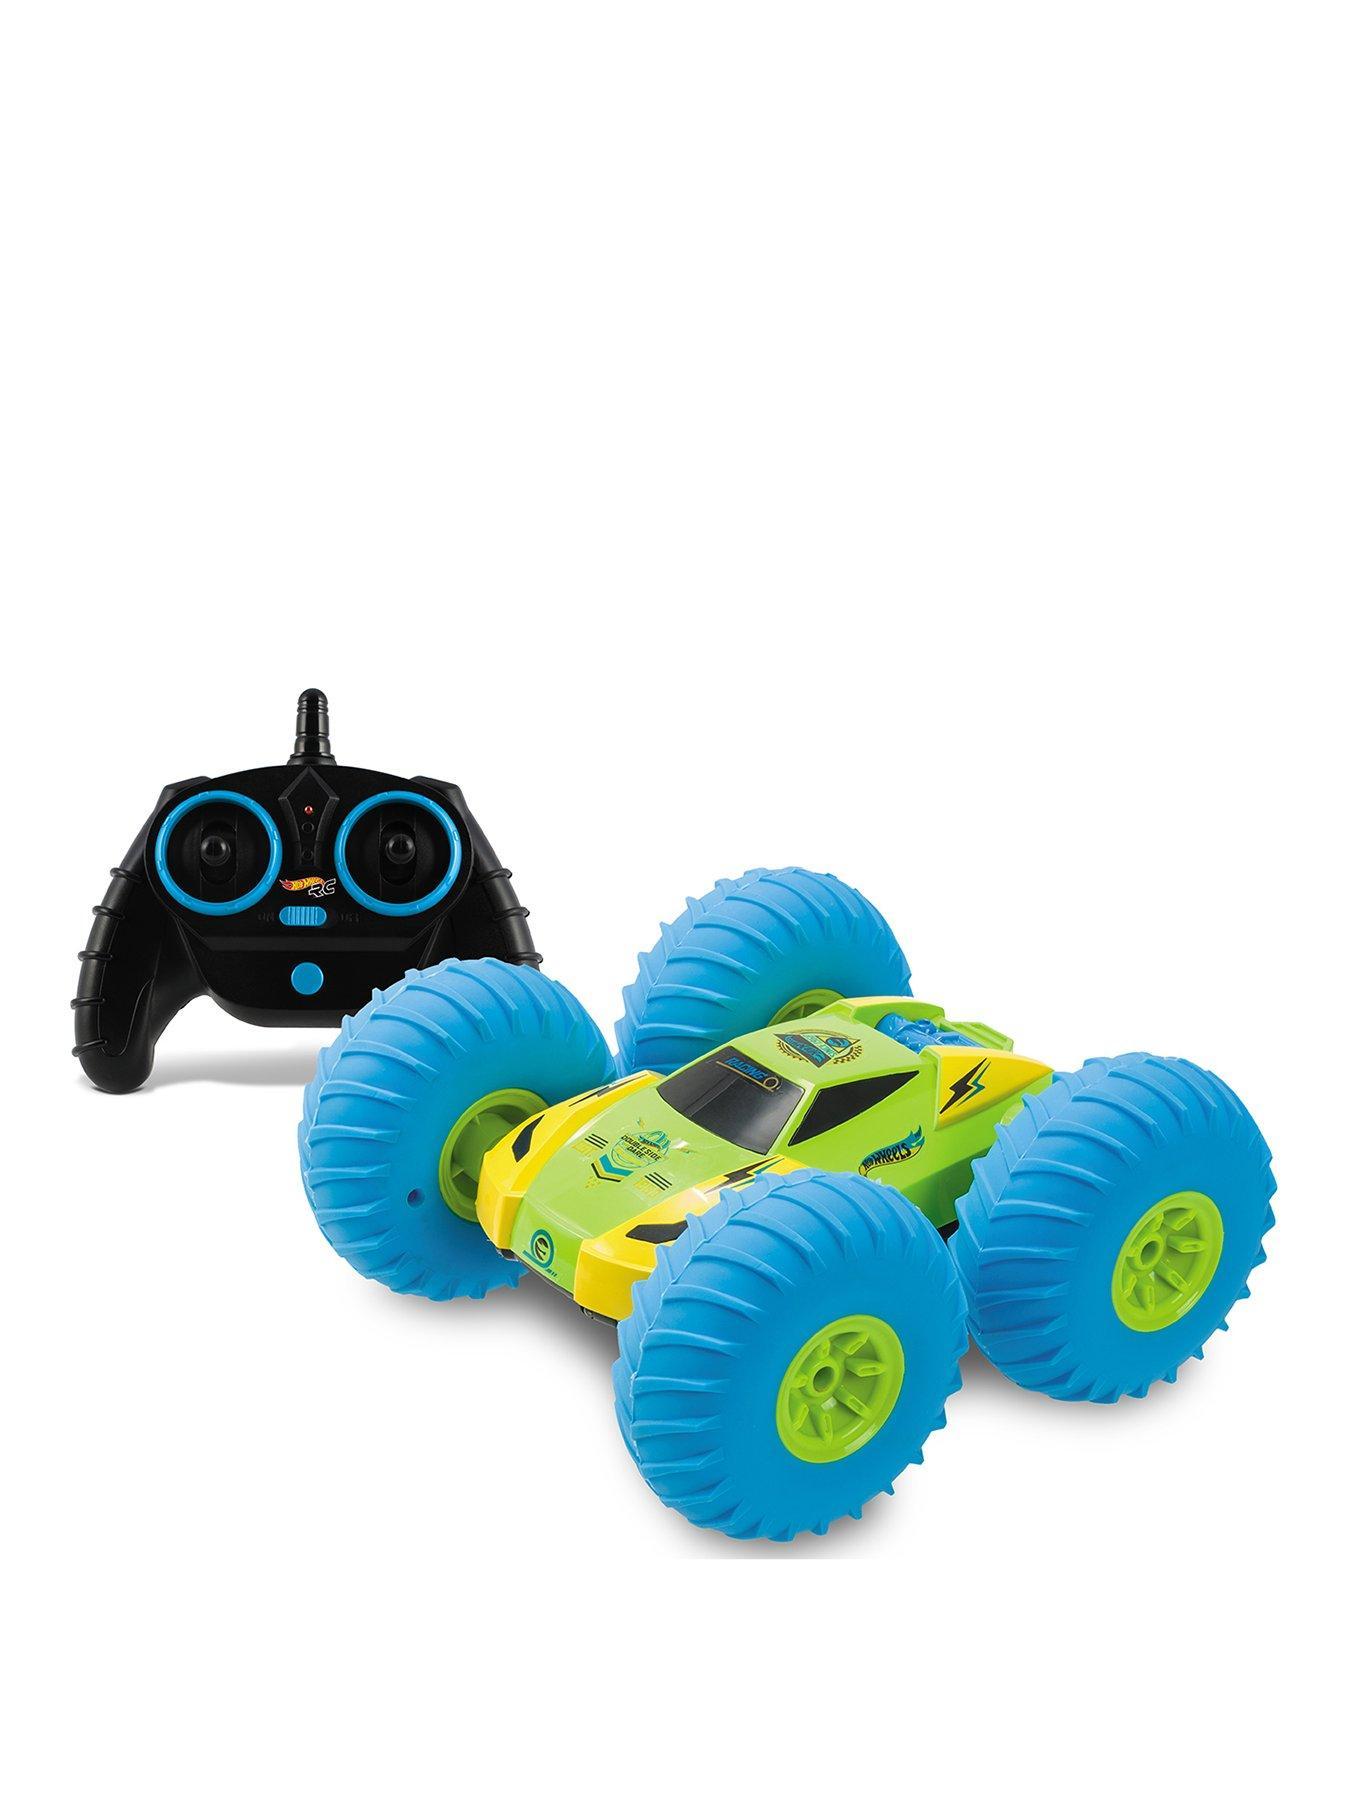 LEGO Duplo Boy Imagine 507 Pants w//Lining 86, Blue Light